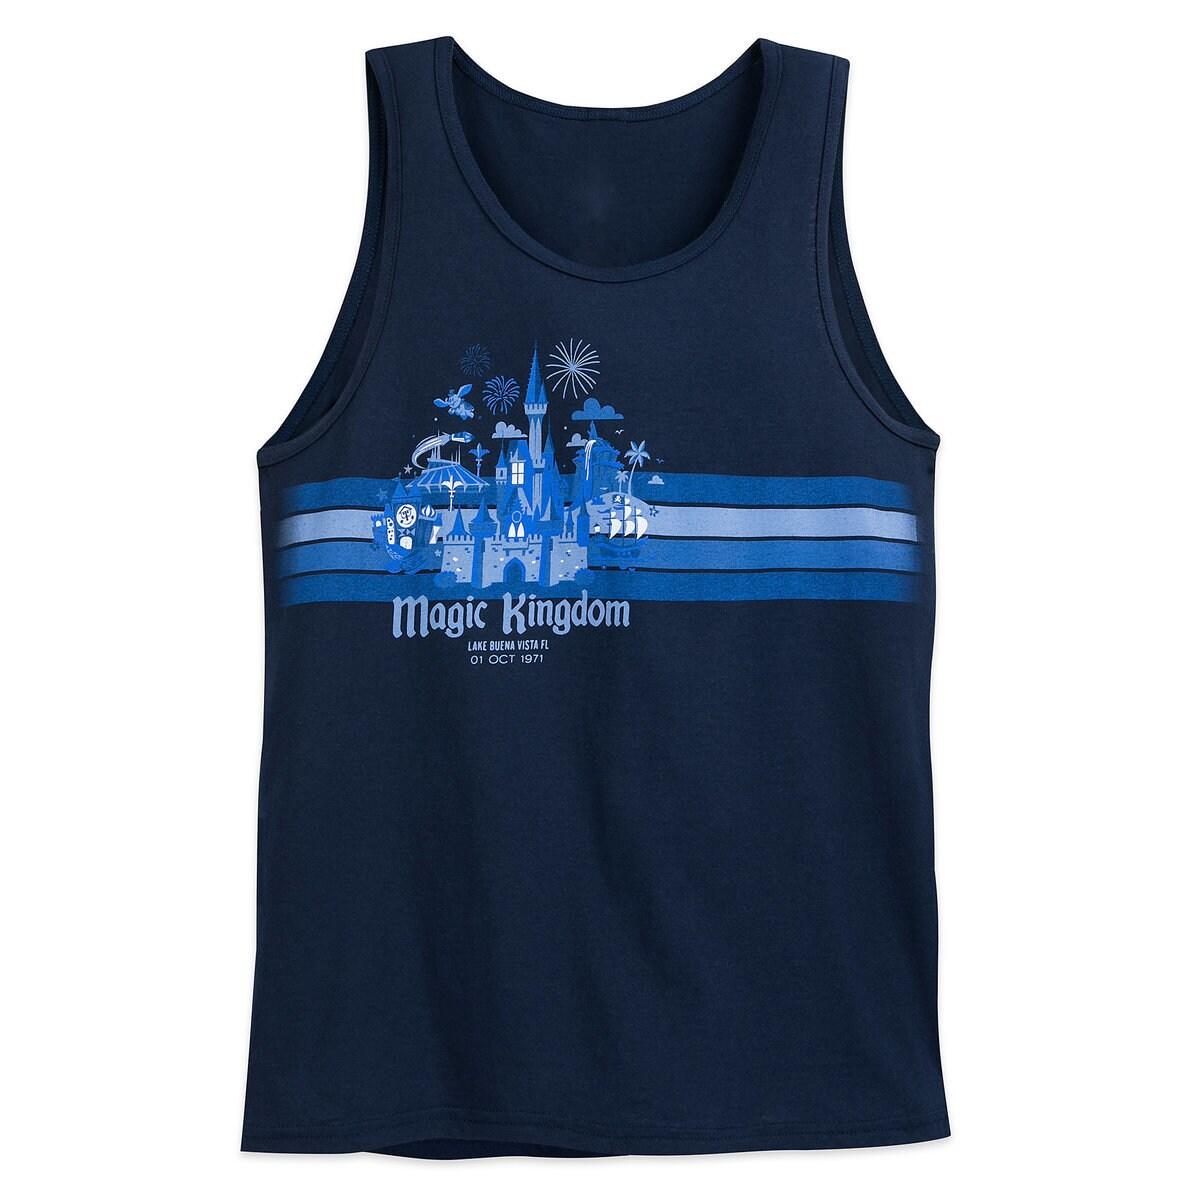 8bd7f0bbb64f9 Product Image of Magic Kingdom Tank Top for Adults - Walt Disney World   1